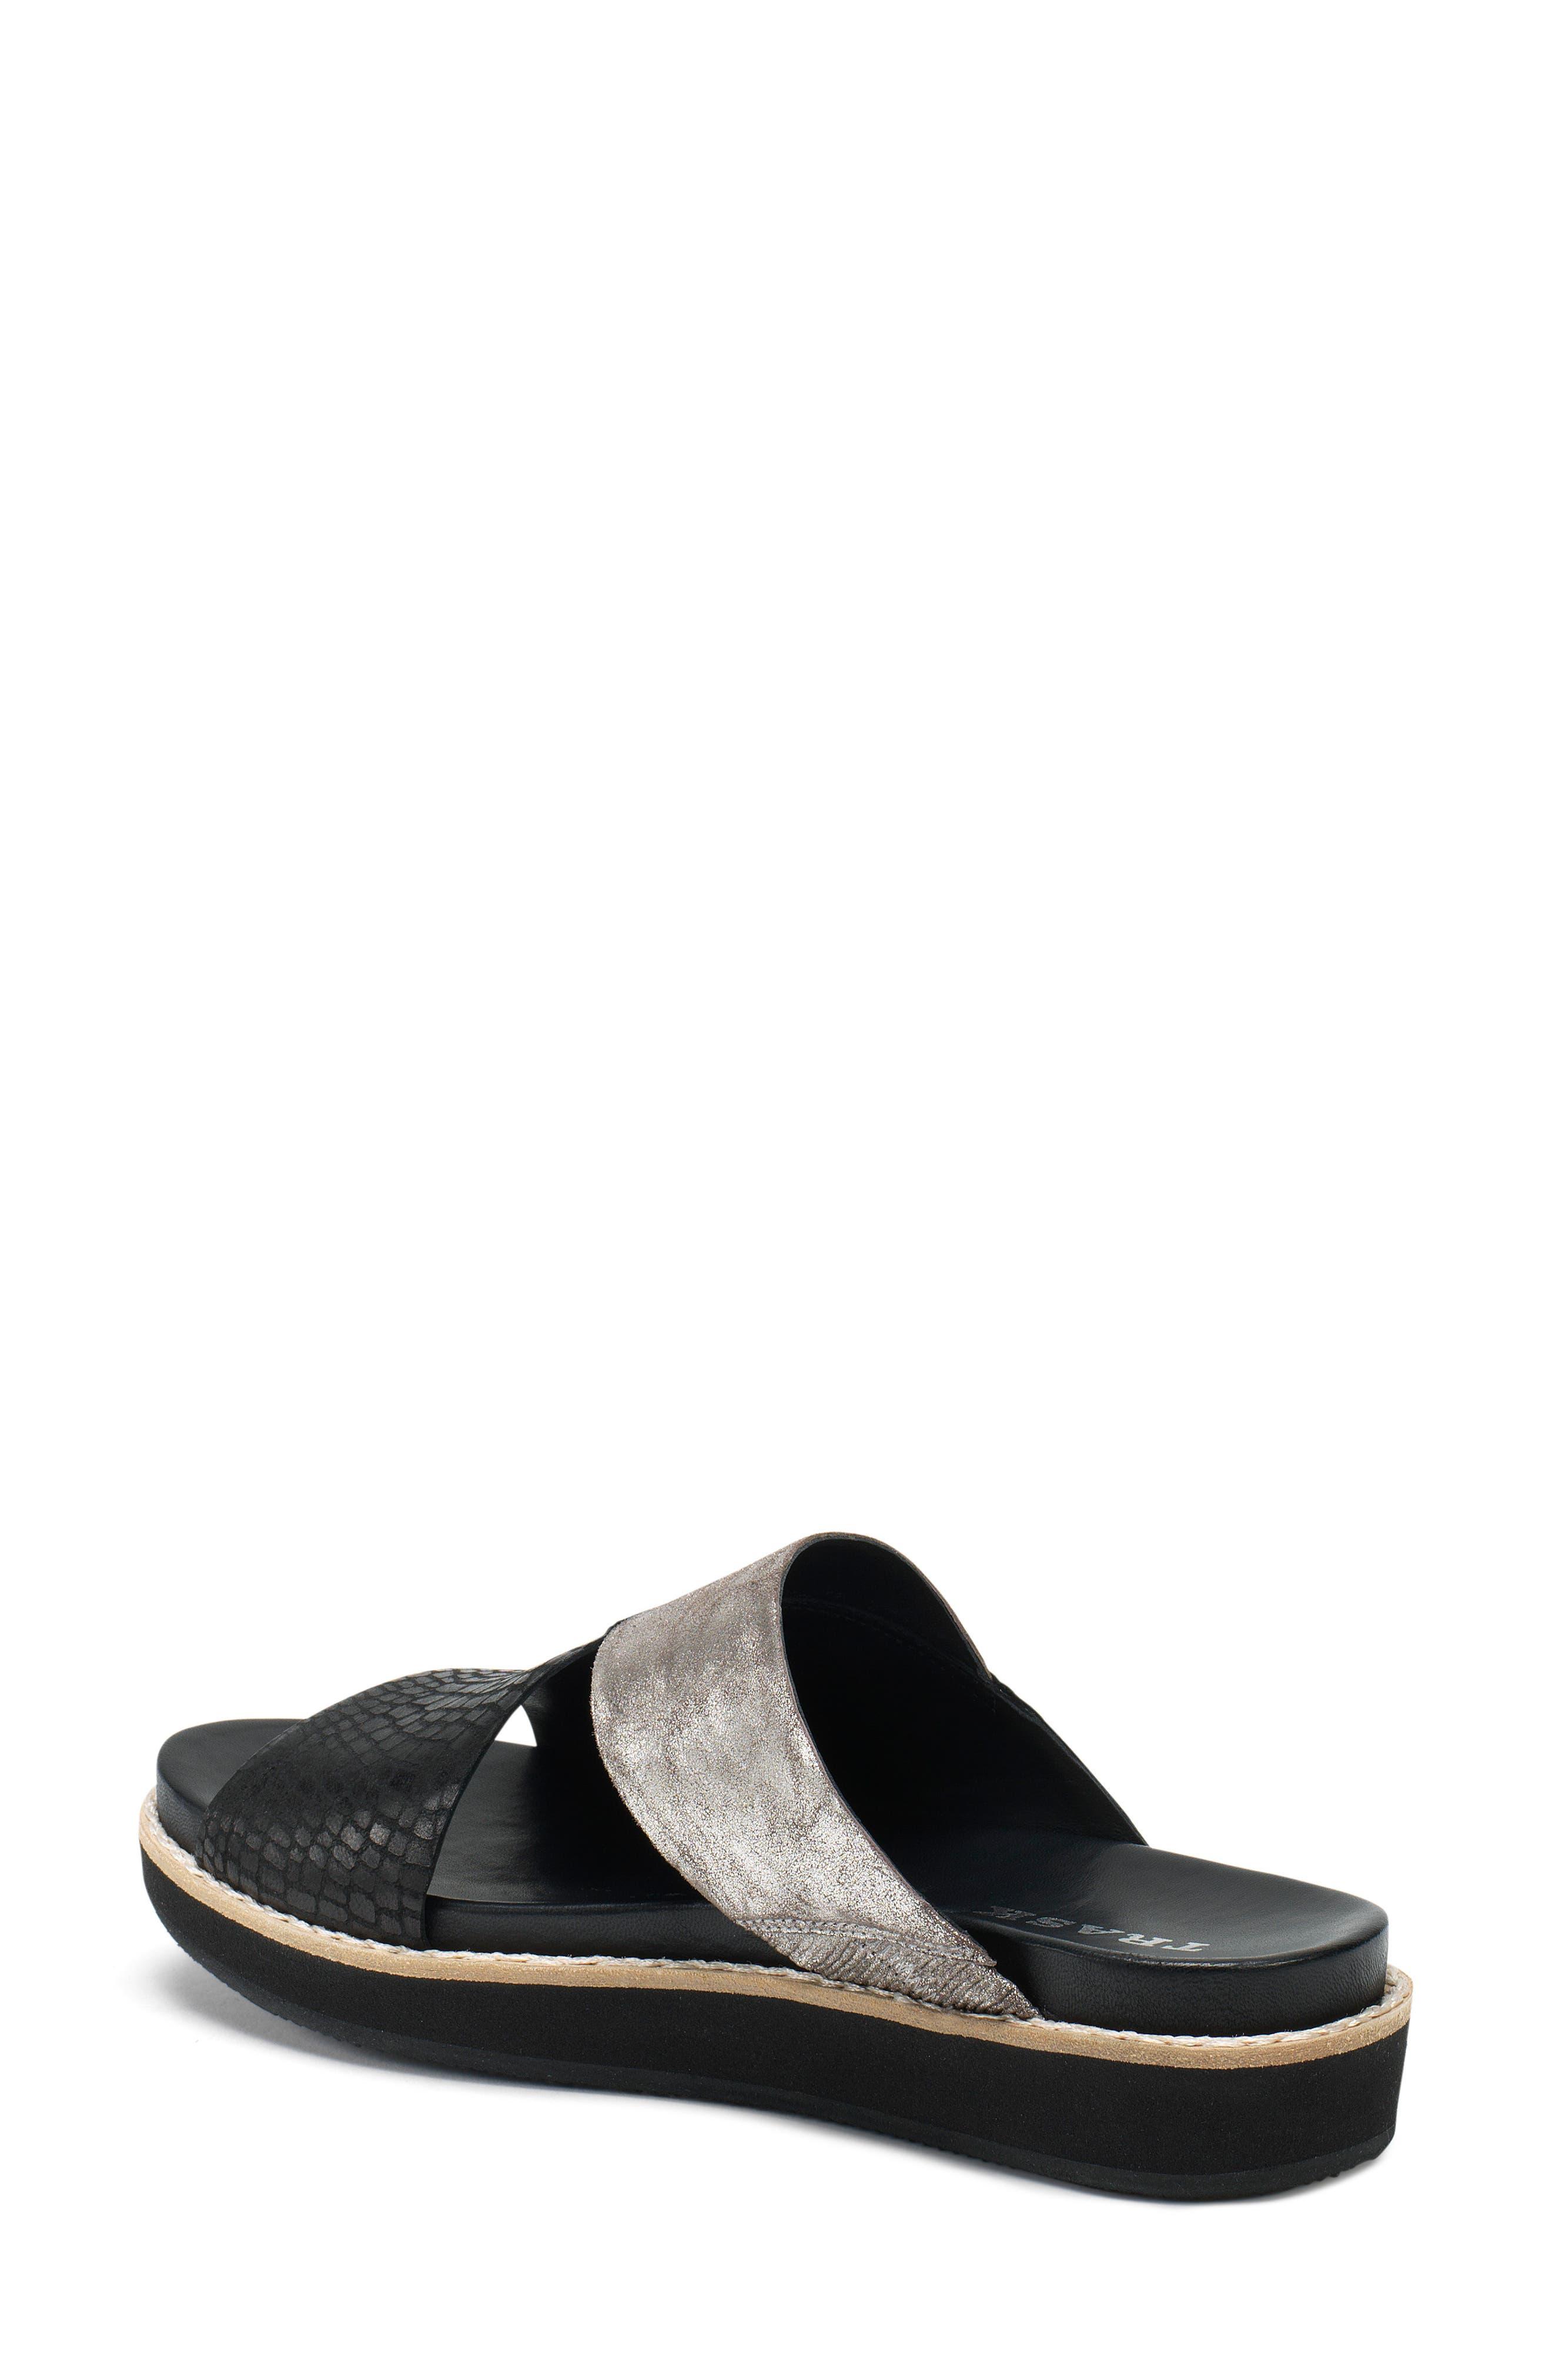 Codi Sandal,                             Alternate thumbnail 2, color,                             Black Embossed Leather